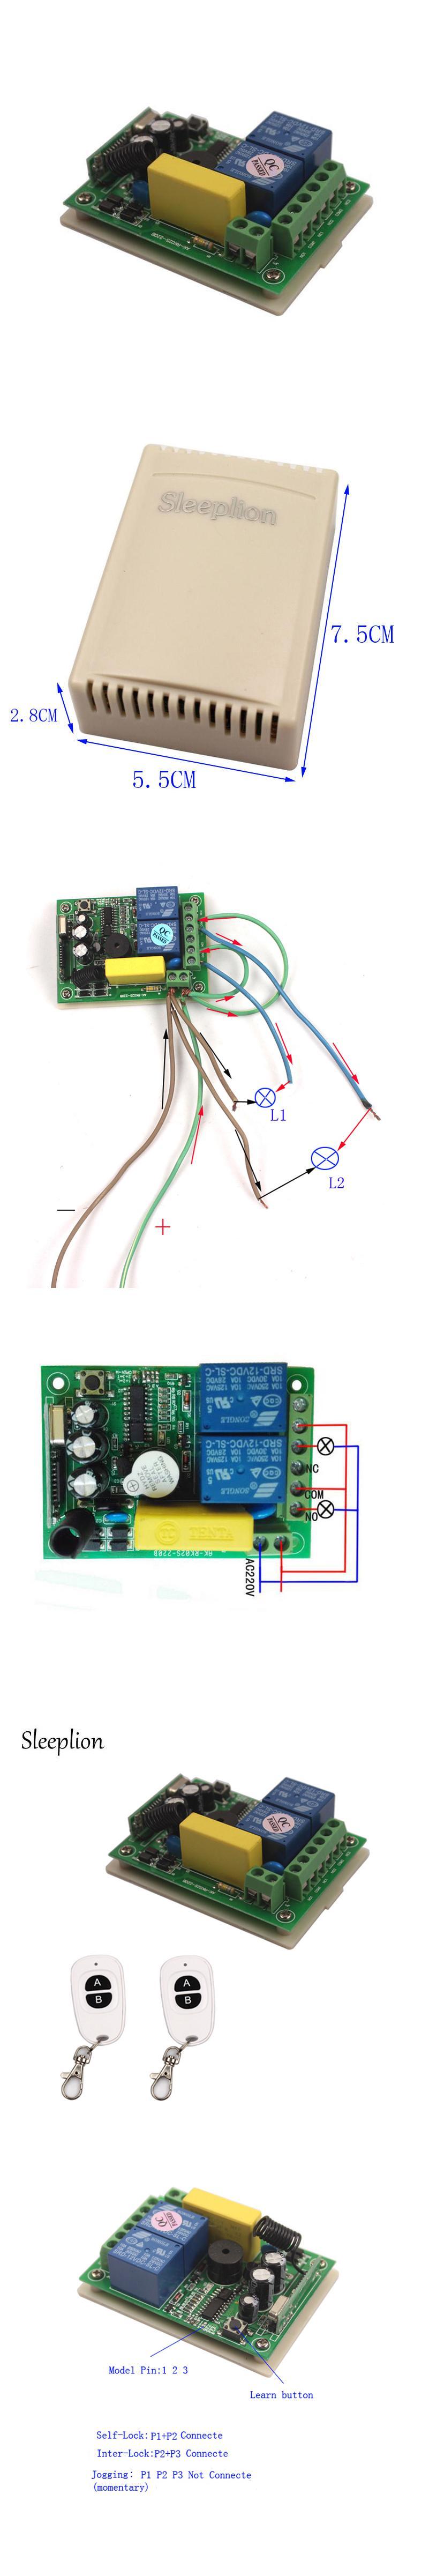 ir rm universal gang pin light remote on switch controller intelligent pro switcheswifiremoteelectronicsconsumer broadlink electronics rf wifi